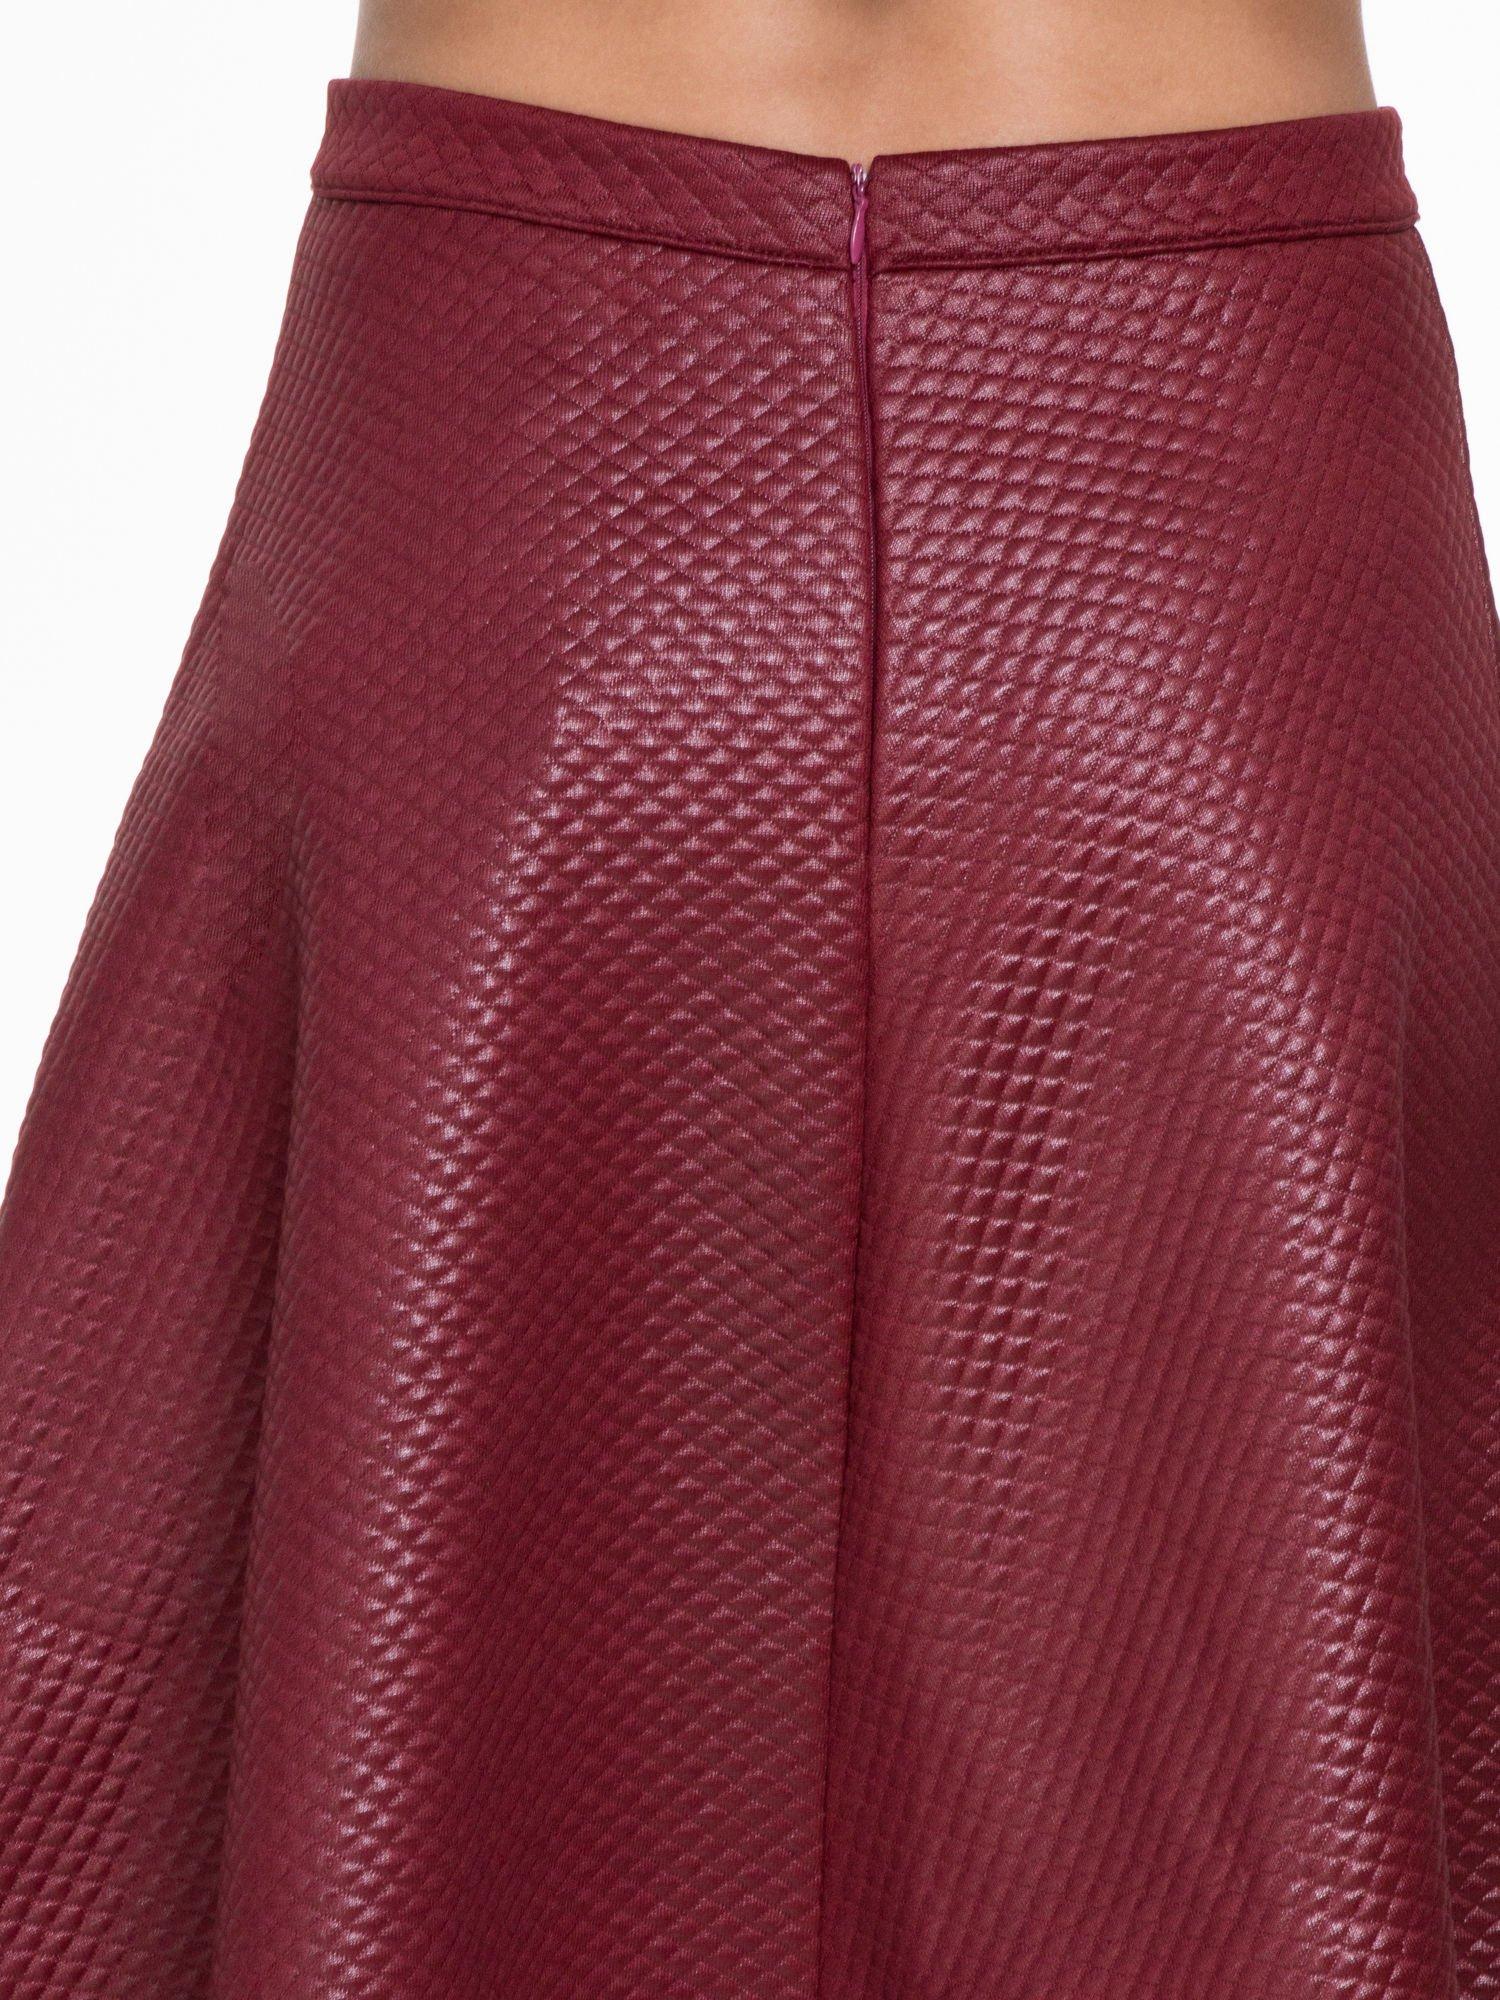 Bordowa pikowana spódnica midi                                  zdj.                                  6